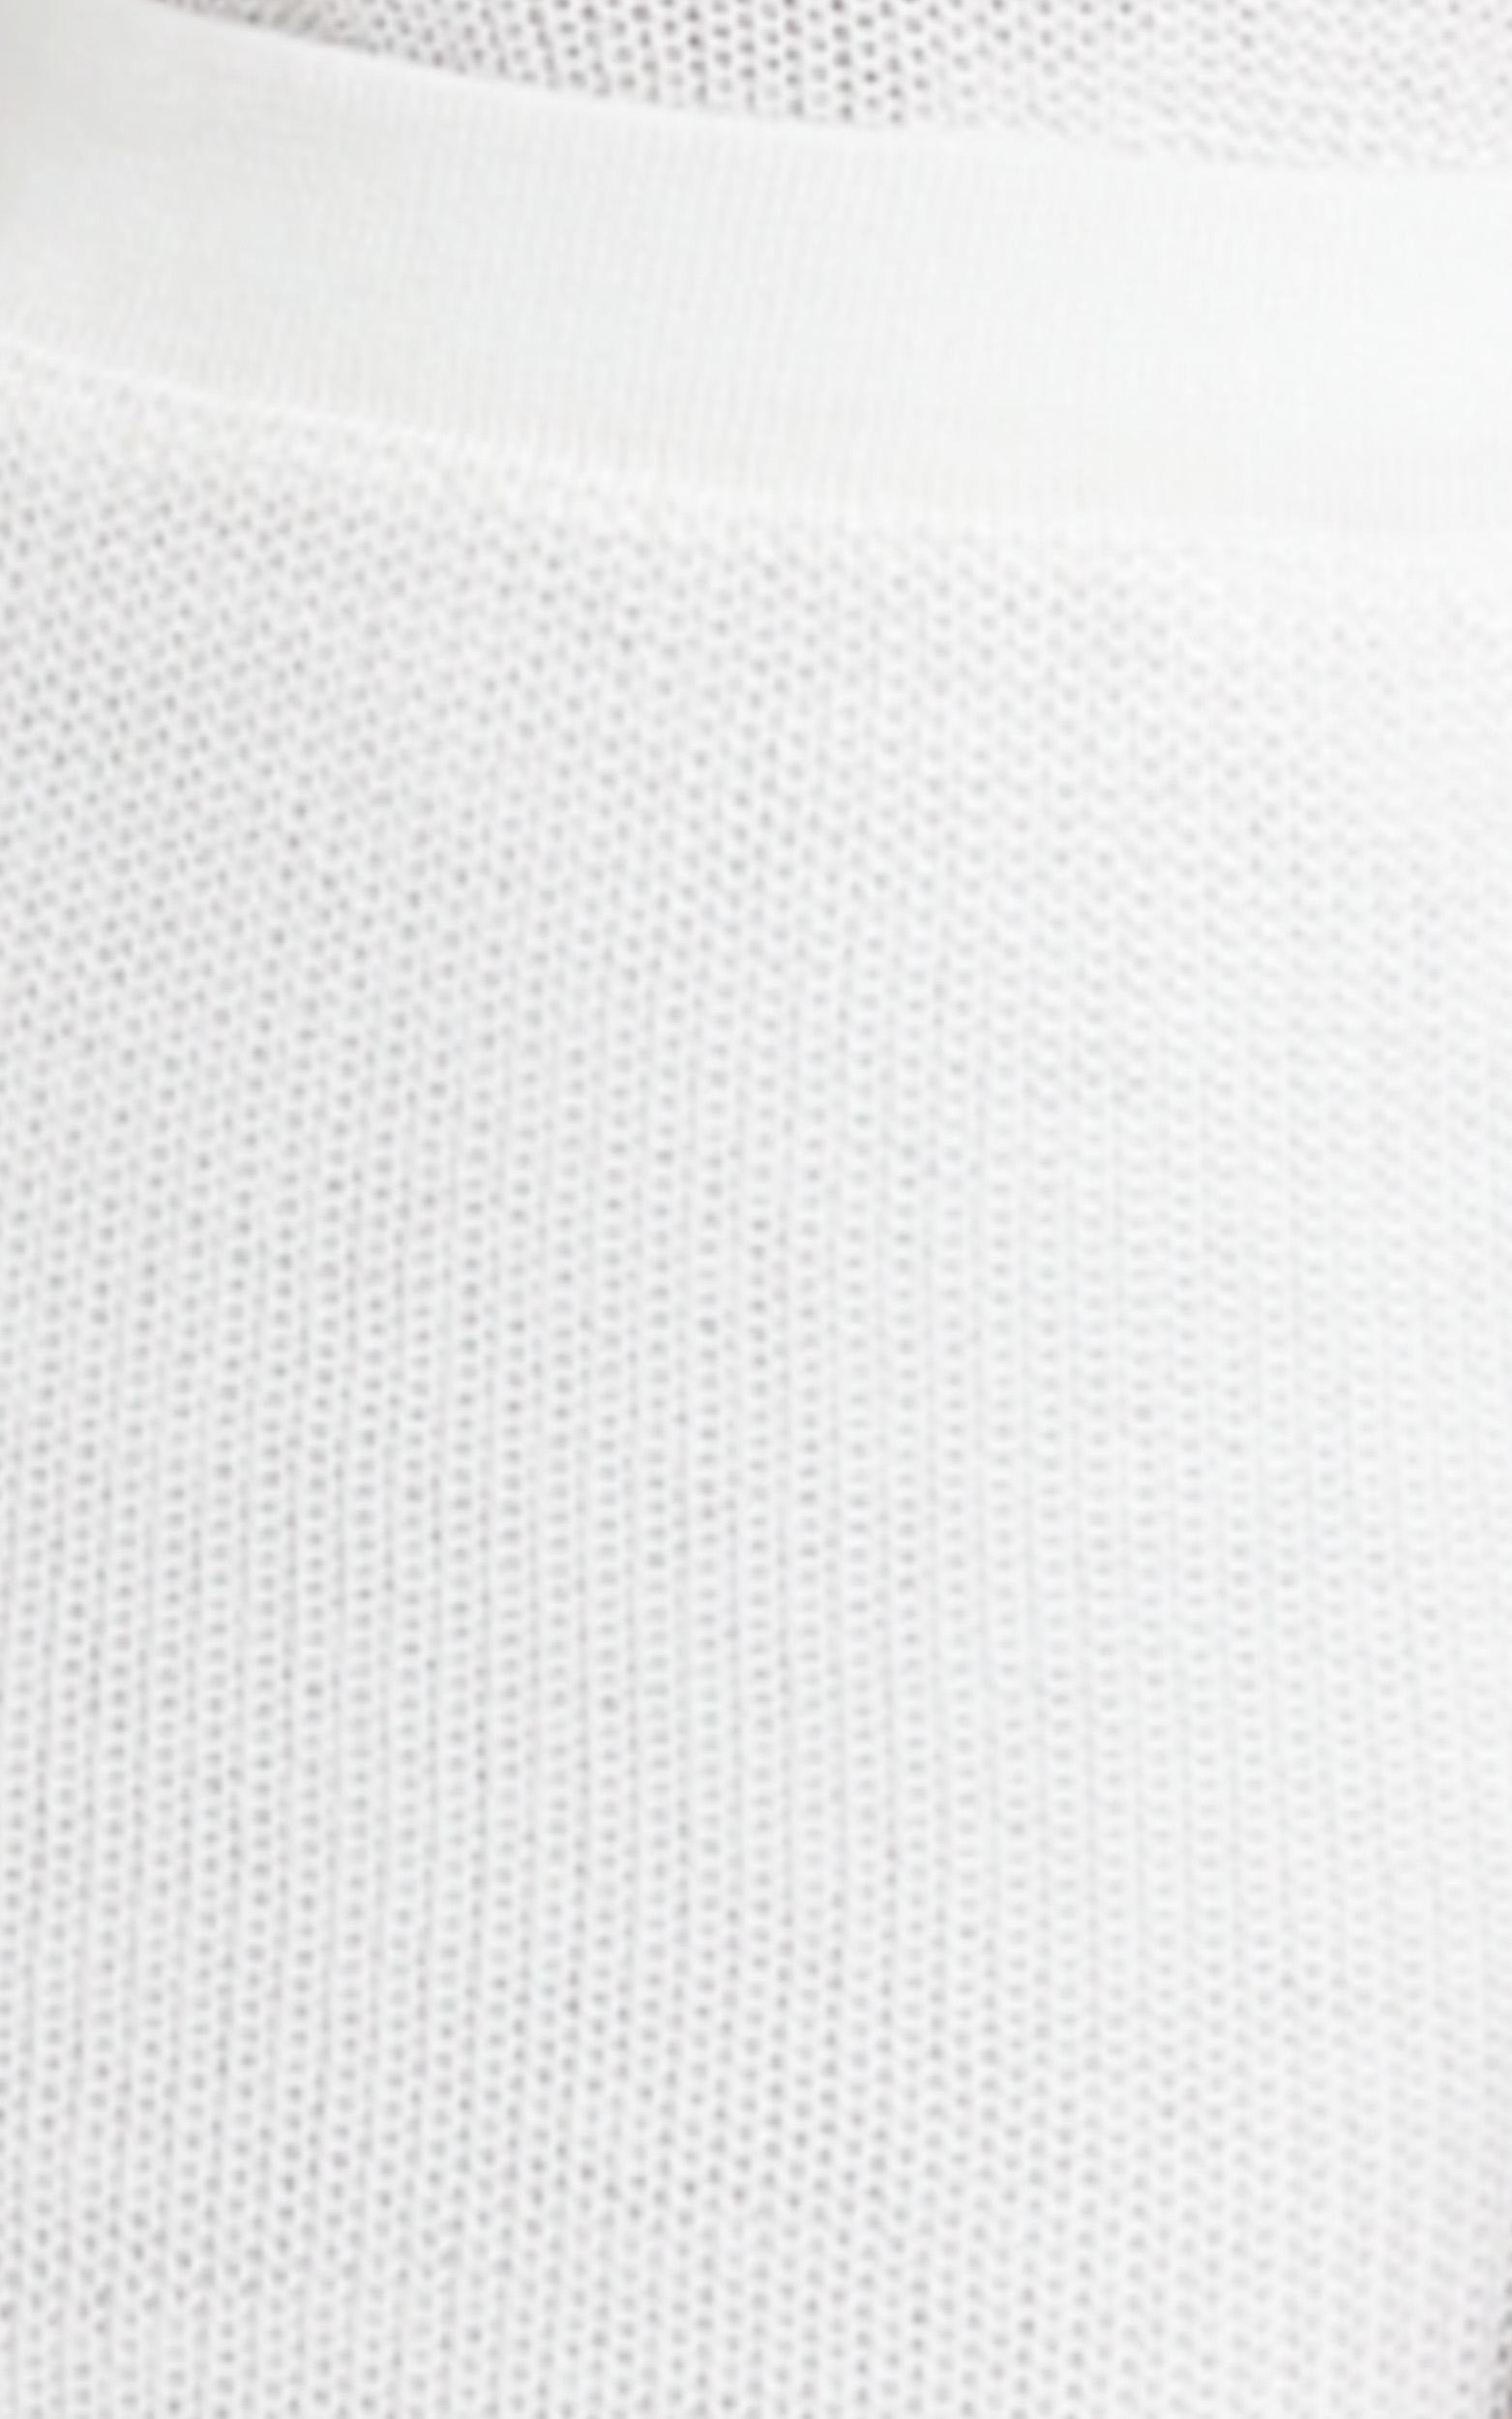 Edwynna Skirt in White - 8 (S), White, hi-res image number null